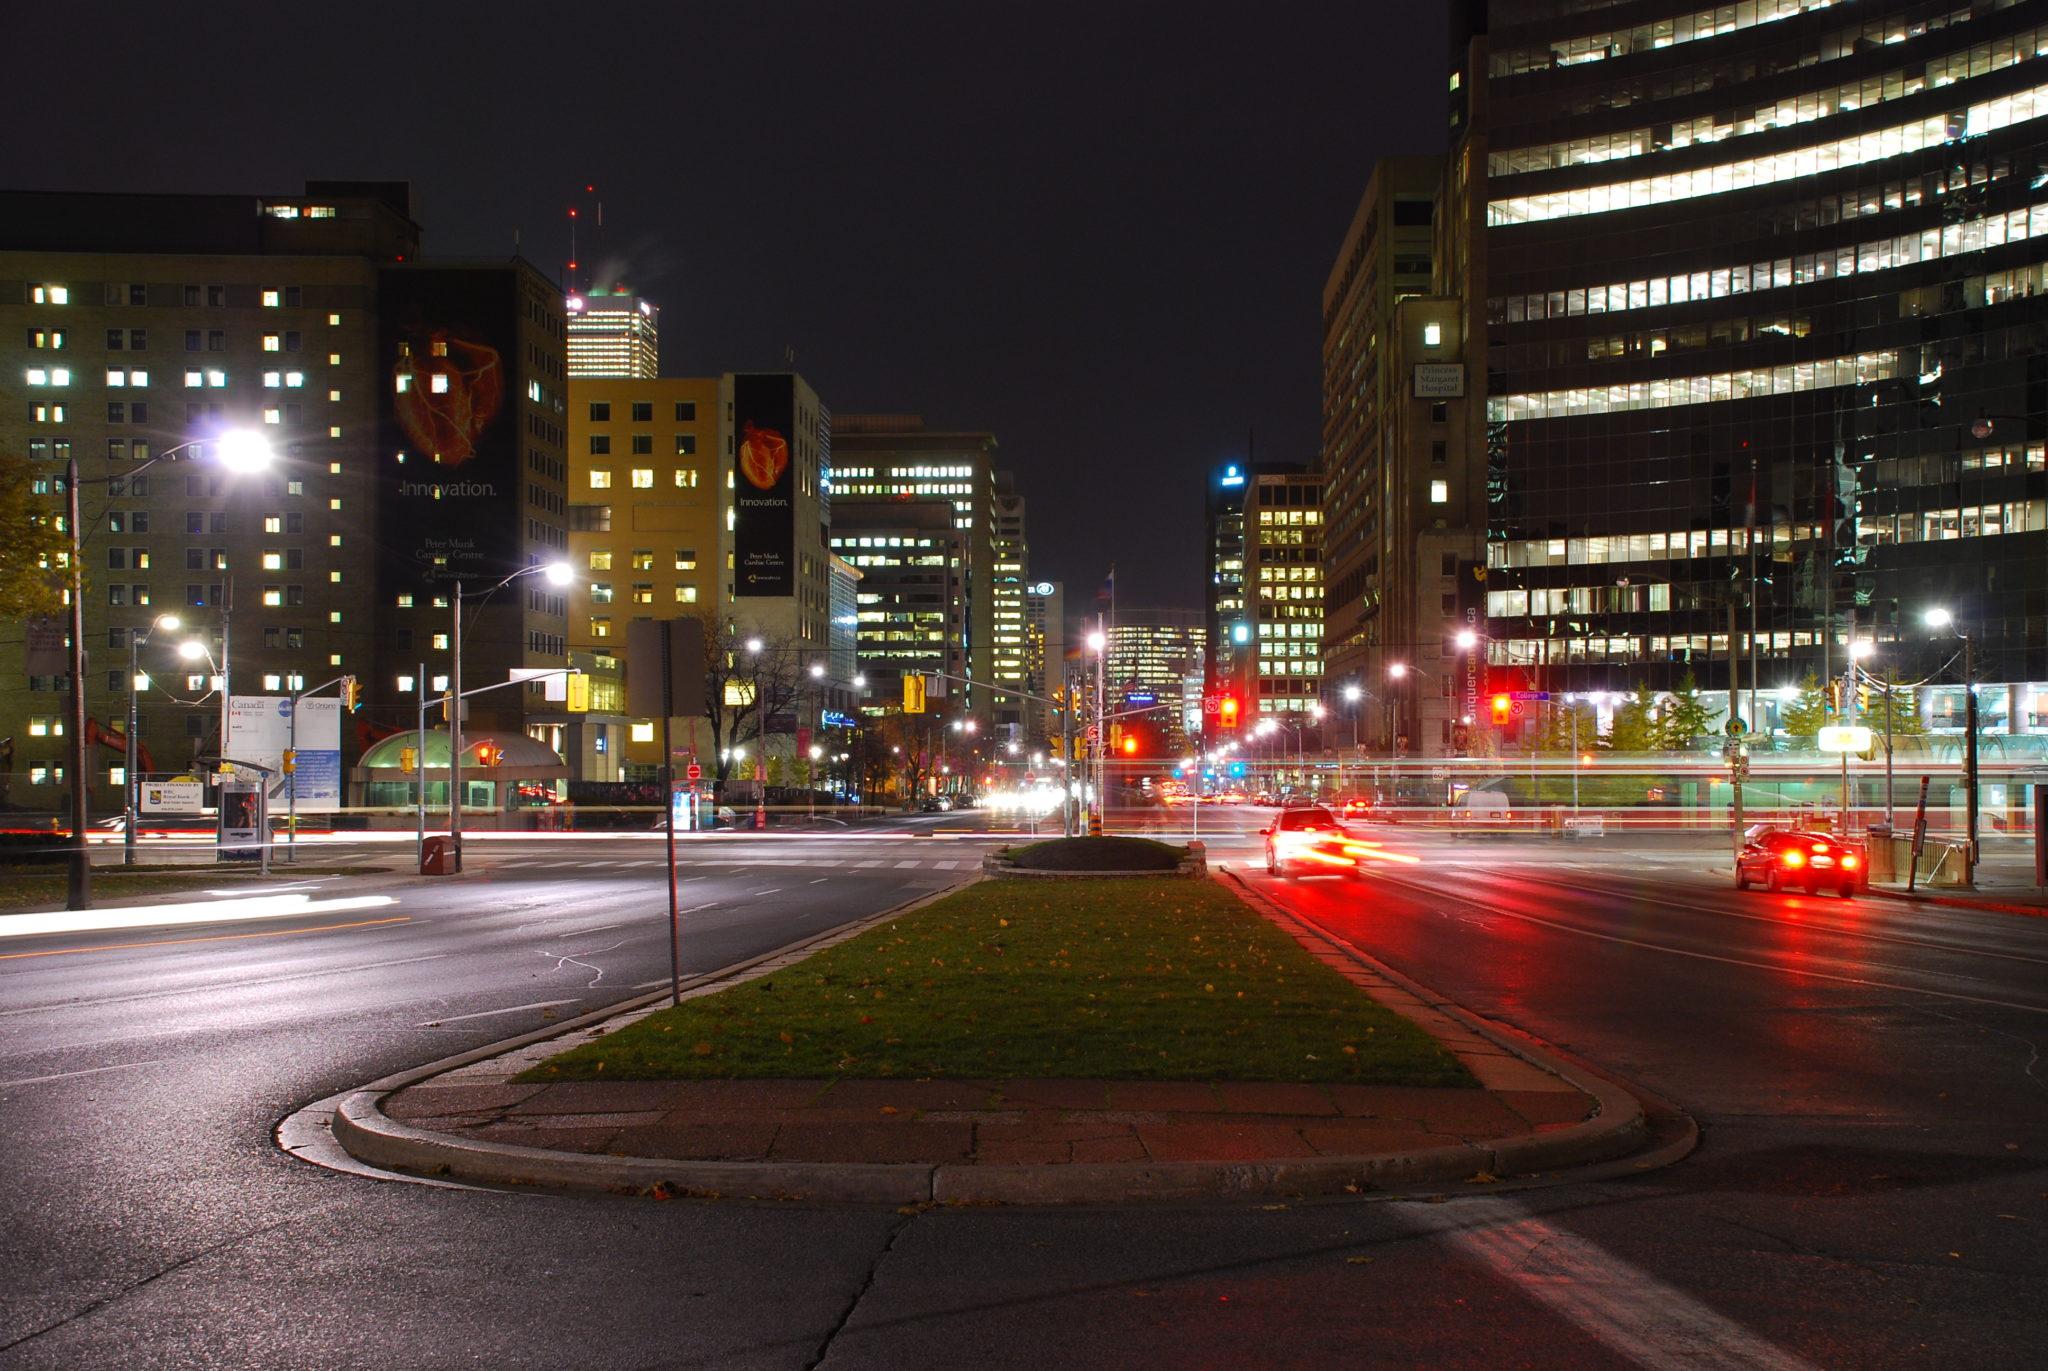 Night view of University Avenue